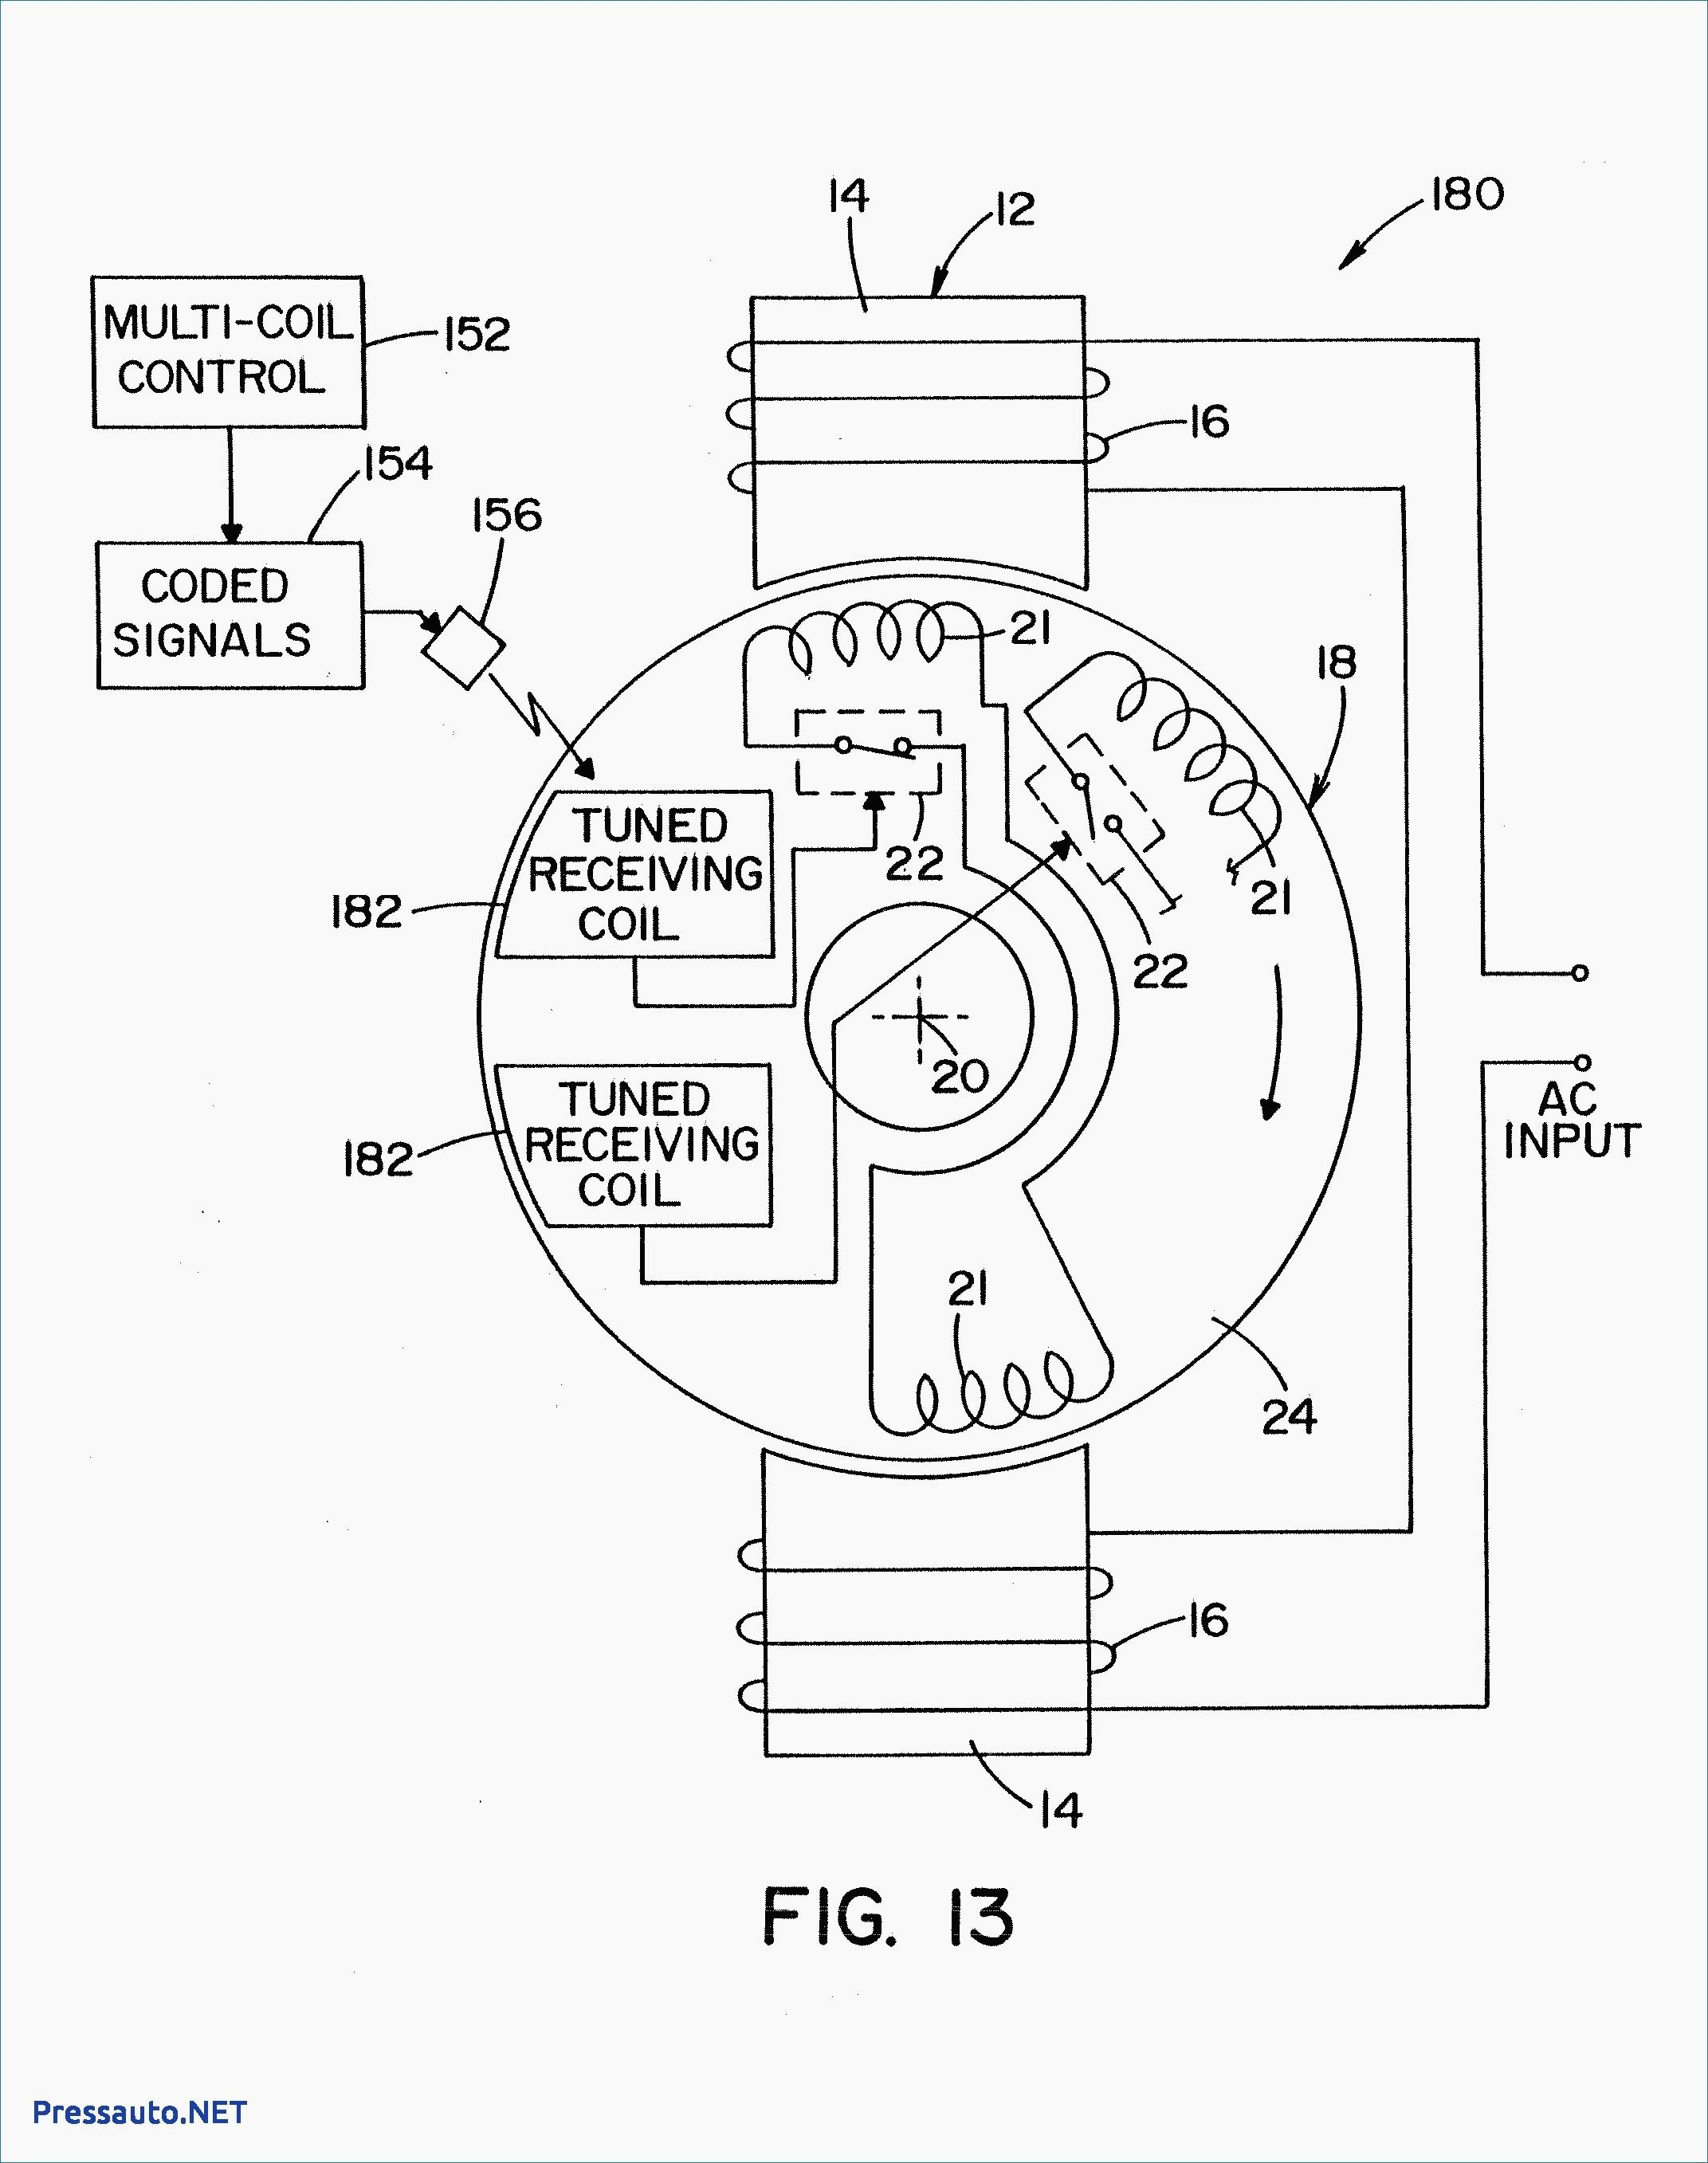 Condenser Fan Wiring Diagram | Wiring Diagram - Ac Fan Motor Wiring Diagram